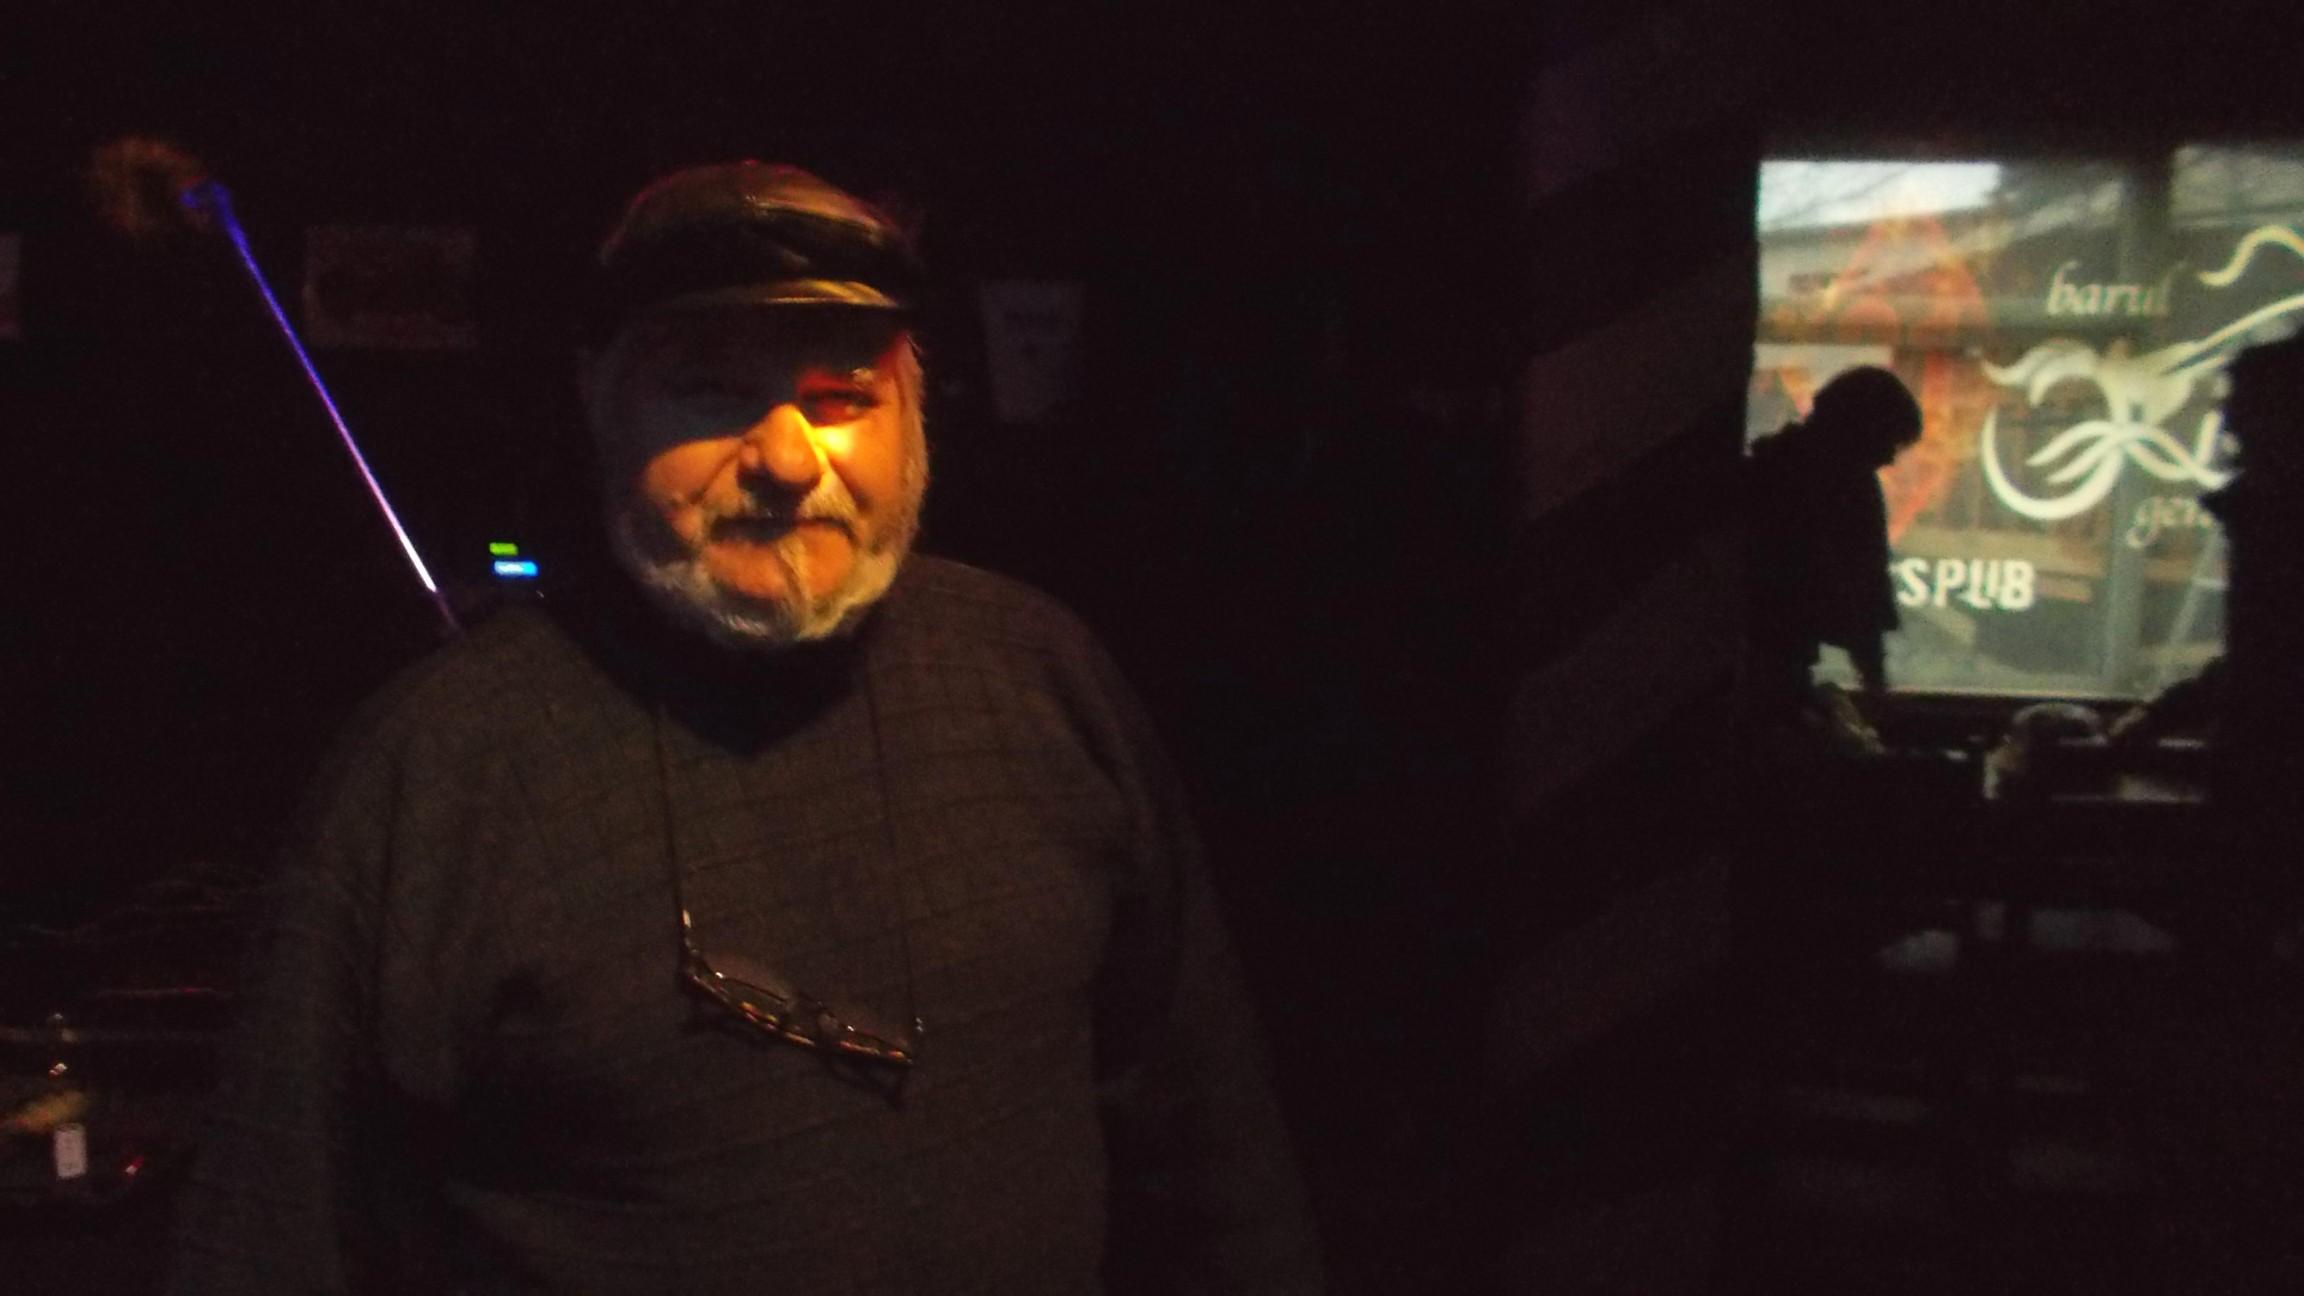 Ăl mai tare rocker din Suceava: Viorel Muha